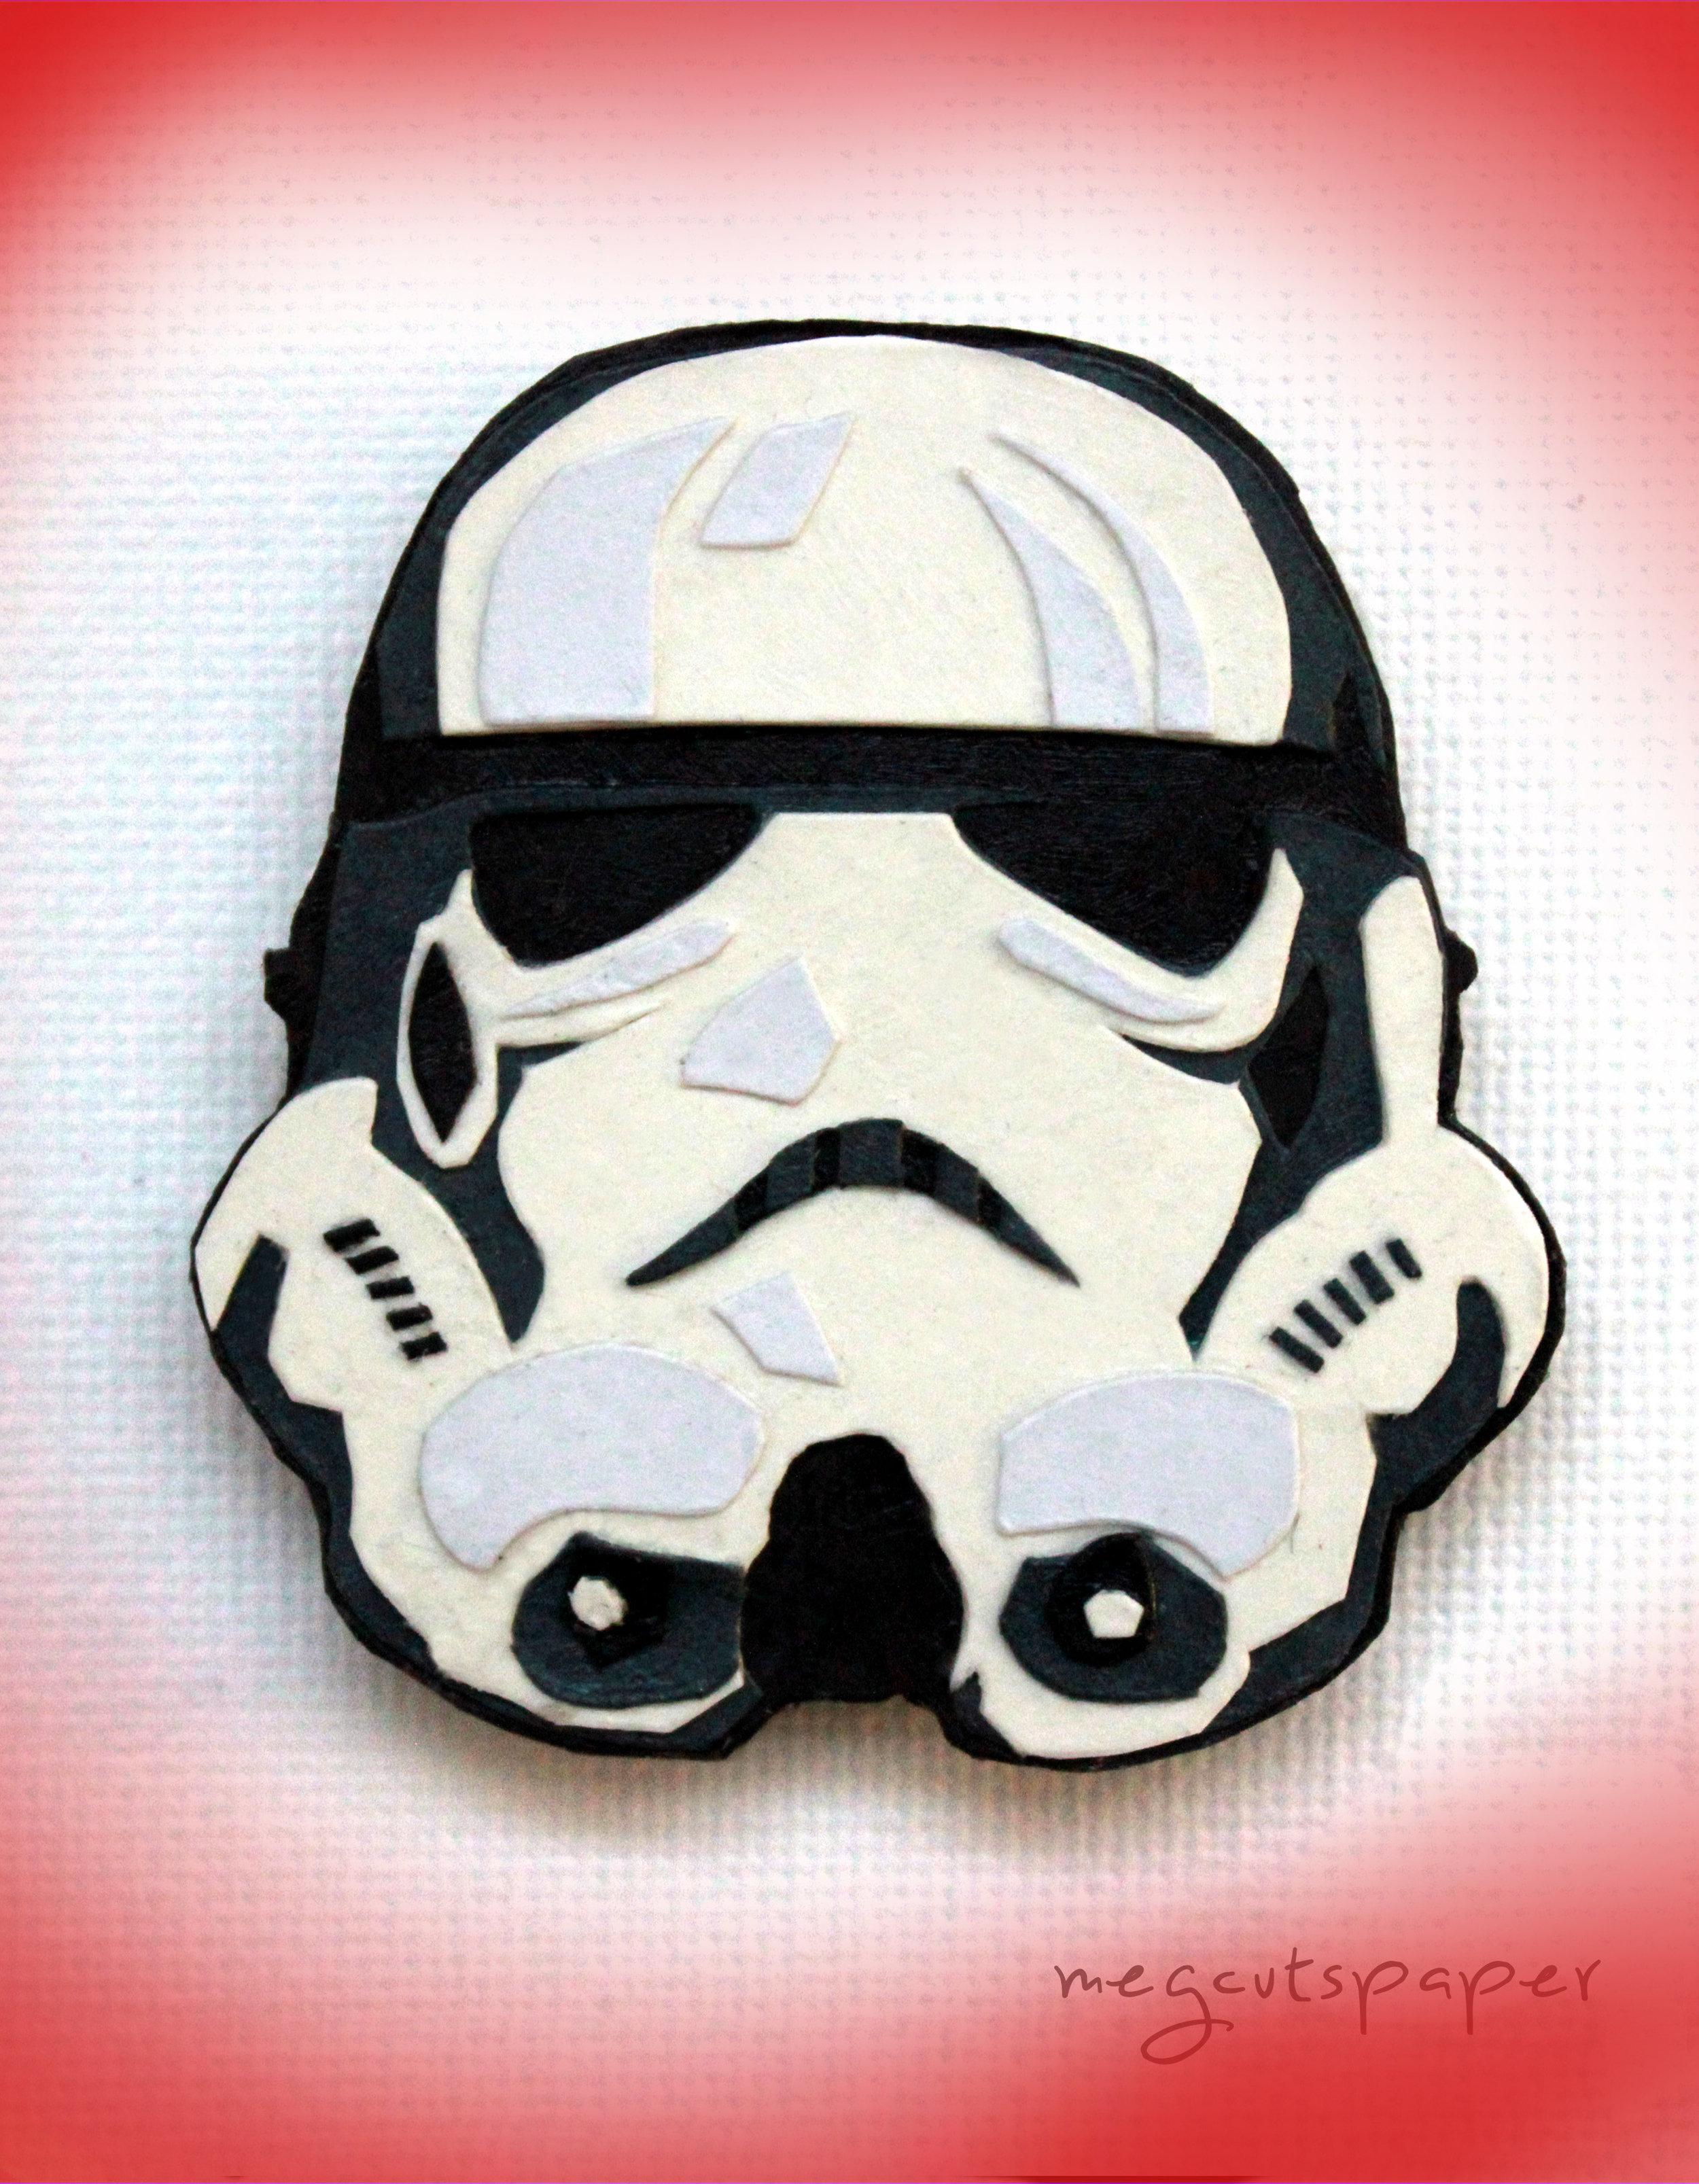 Megcutspaper_Star_Wars_Storm_Trooper_Magnet.jpg